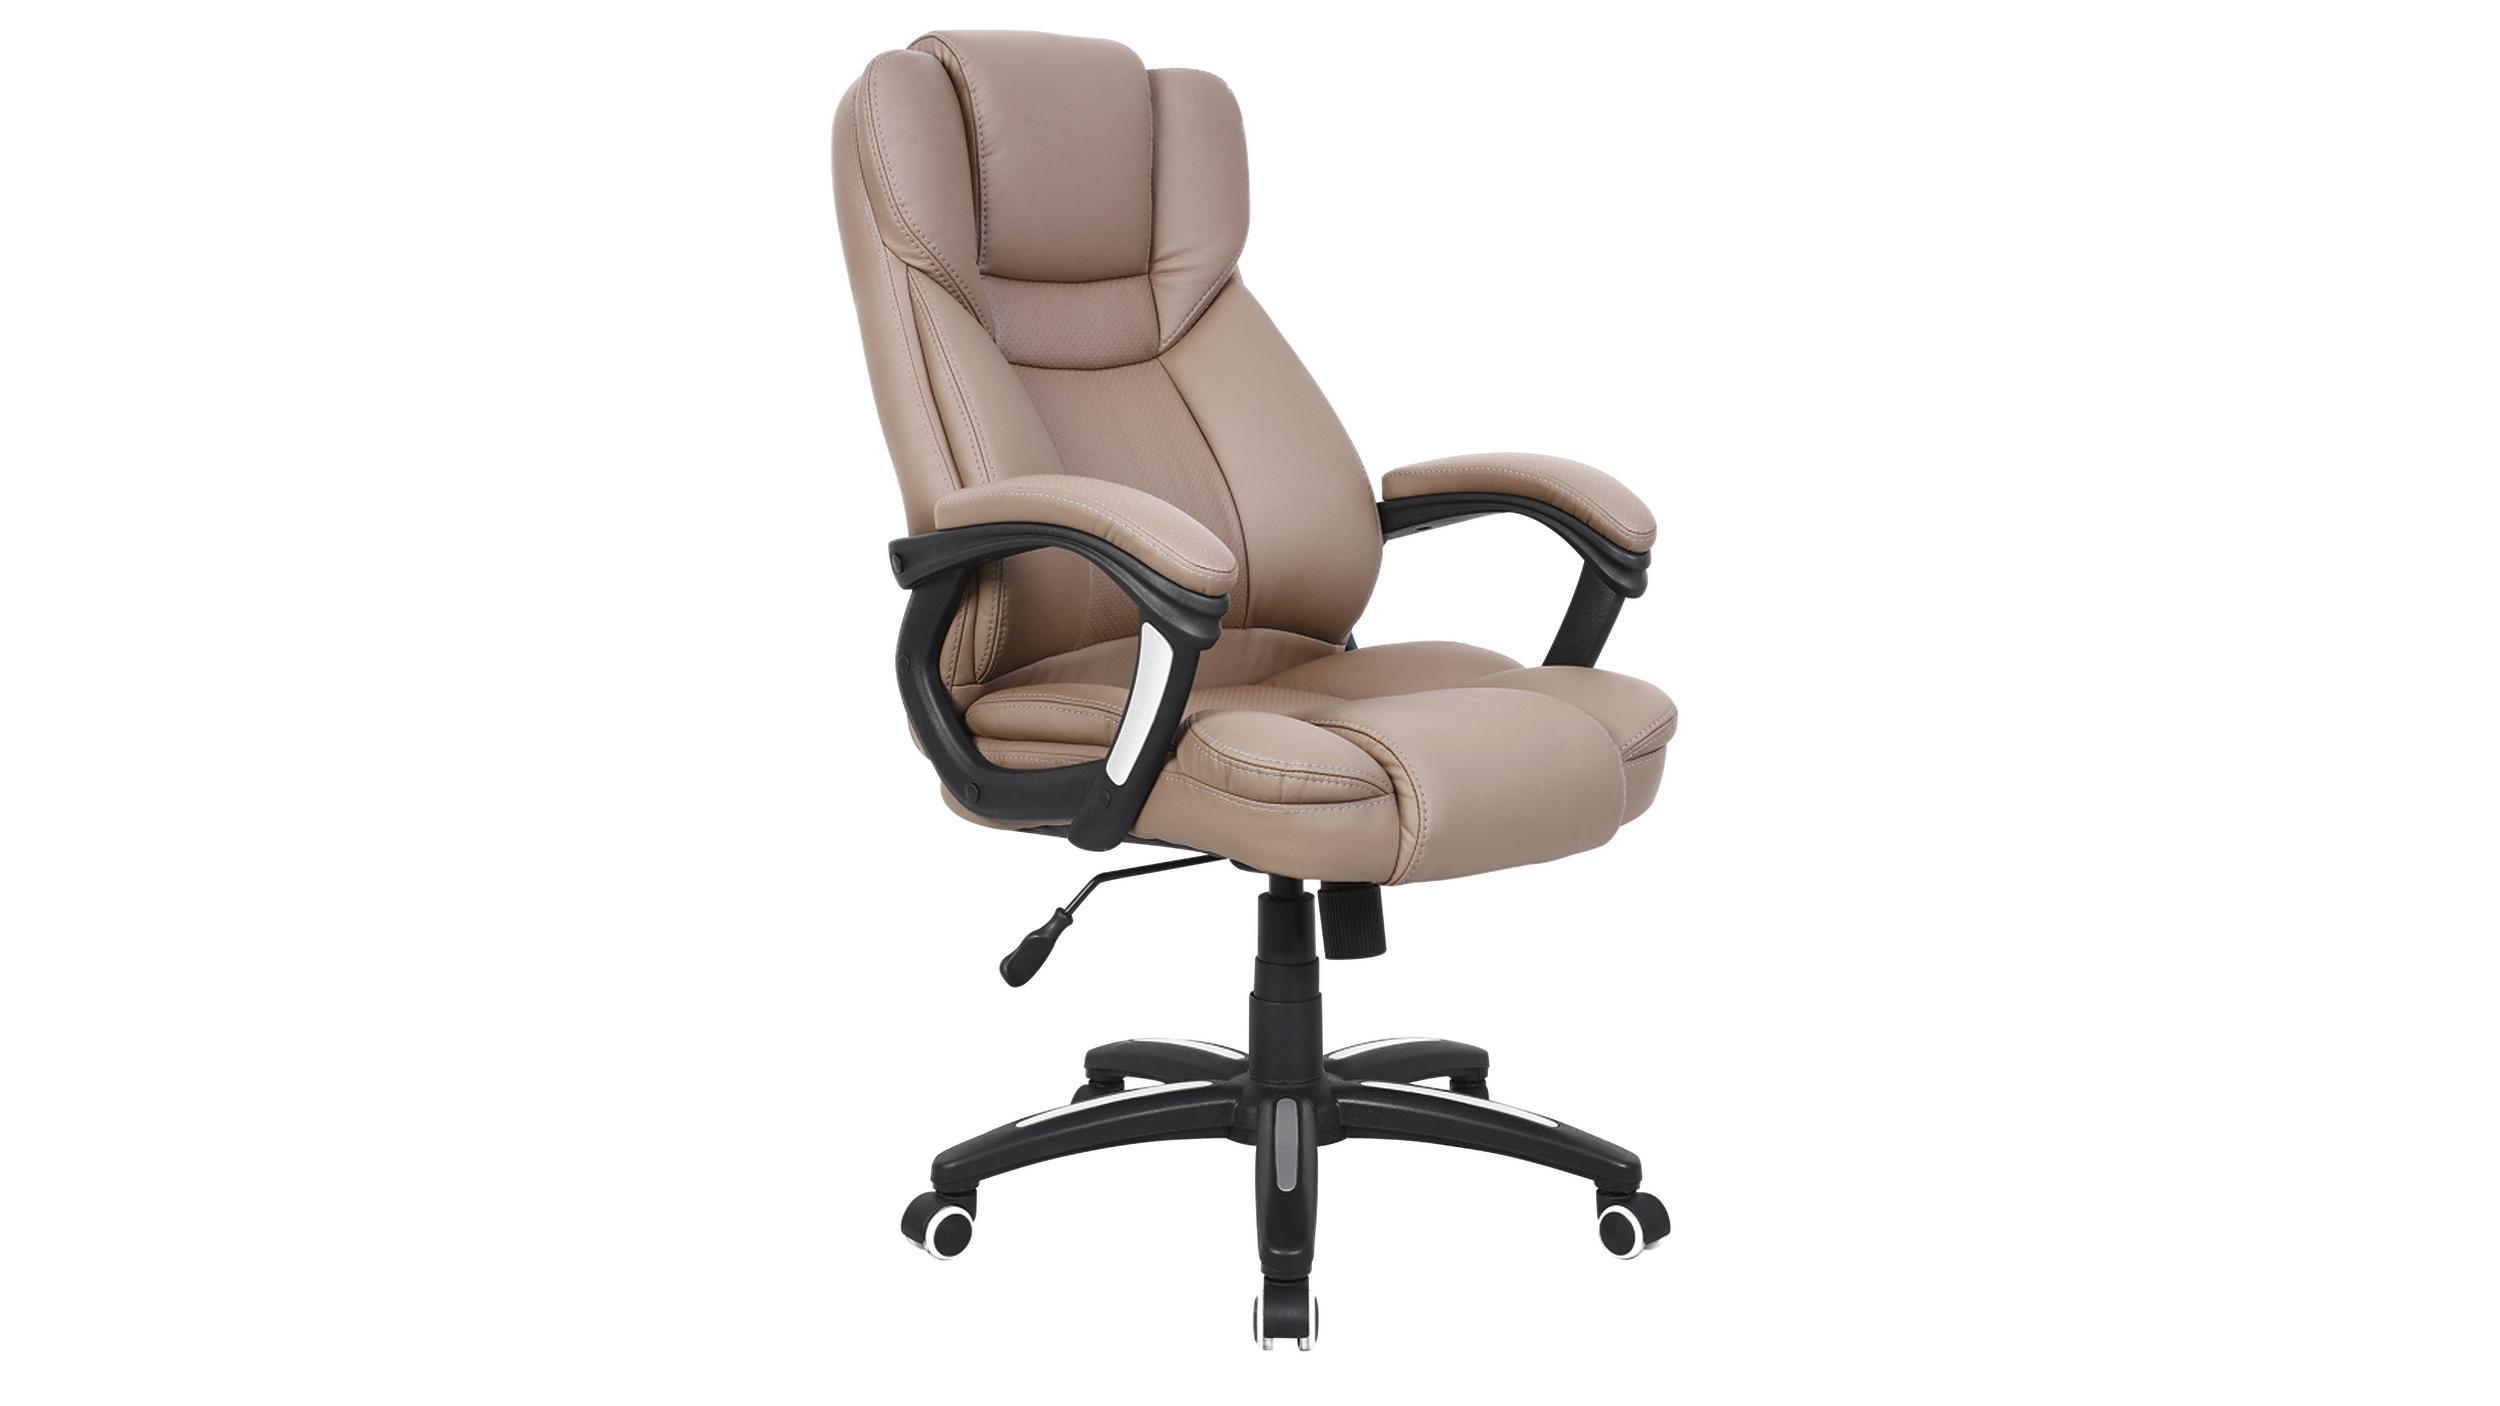 Buy Brighton Office Chair Mushroom Harvey Norman Au